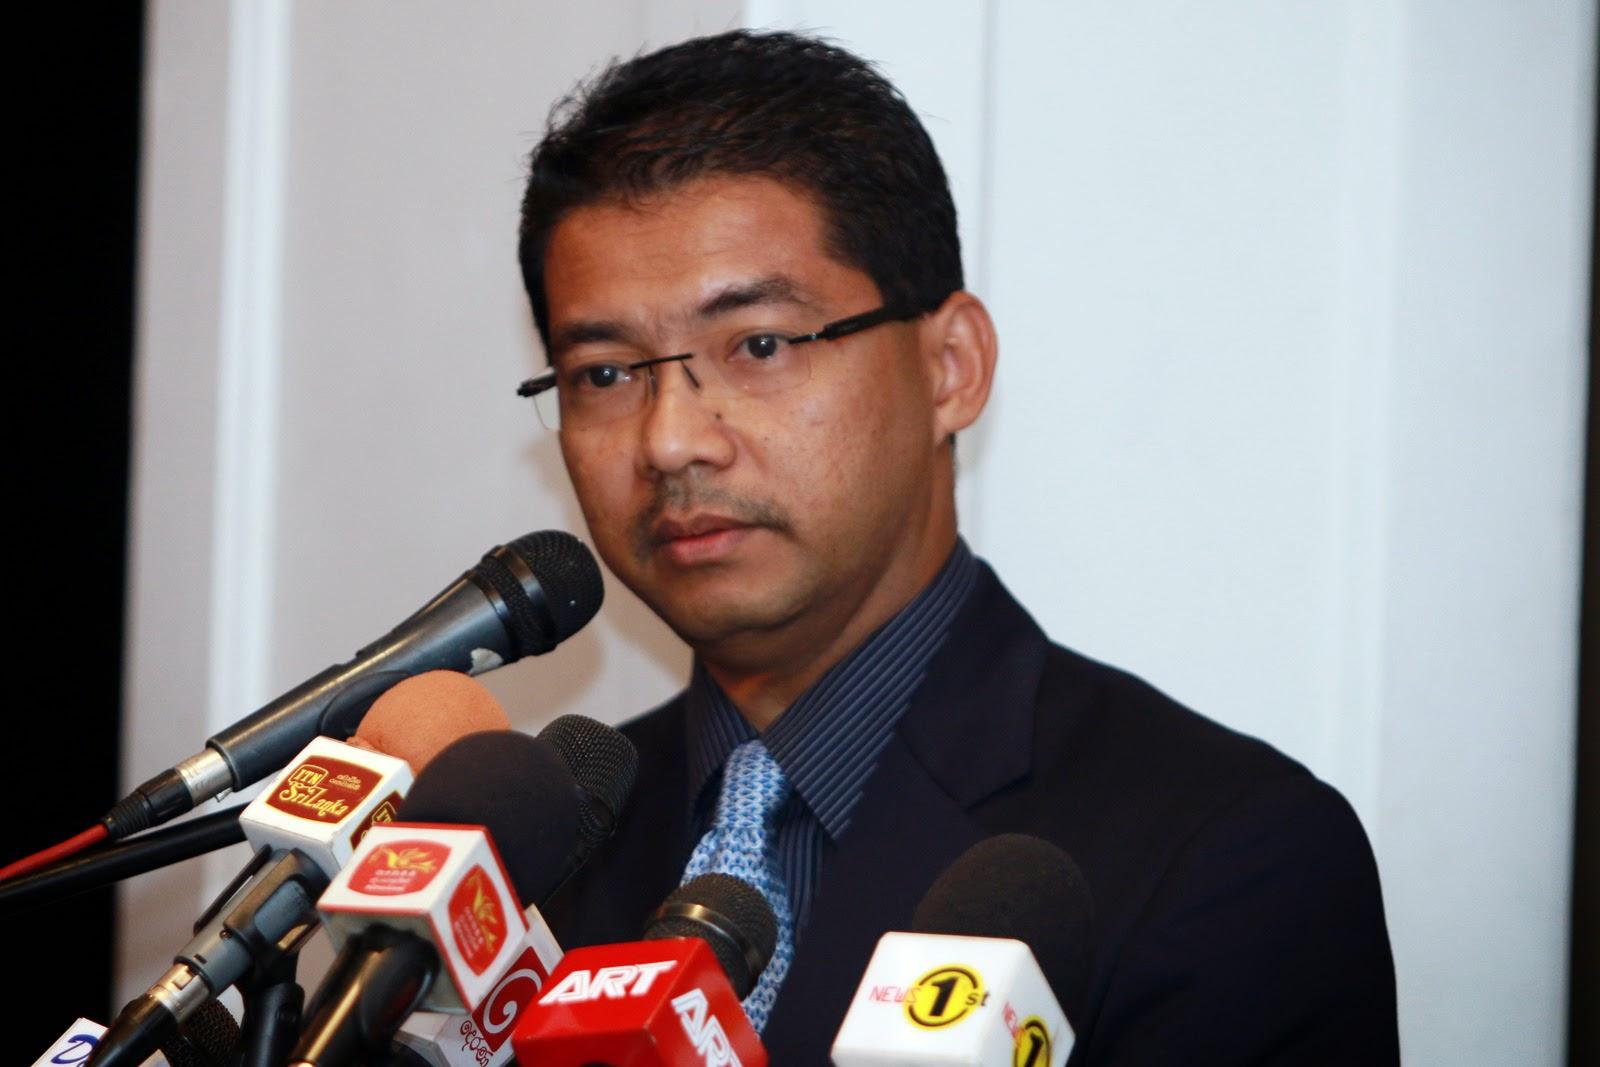 Dato Adissadikin Ali (President/CEO of EXIM Bank Malaysia)